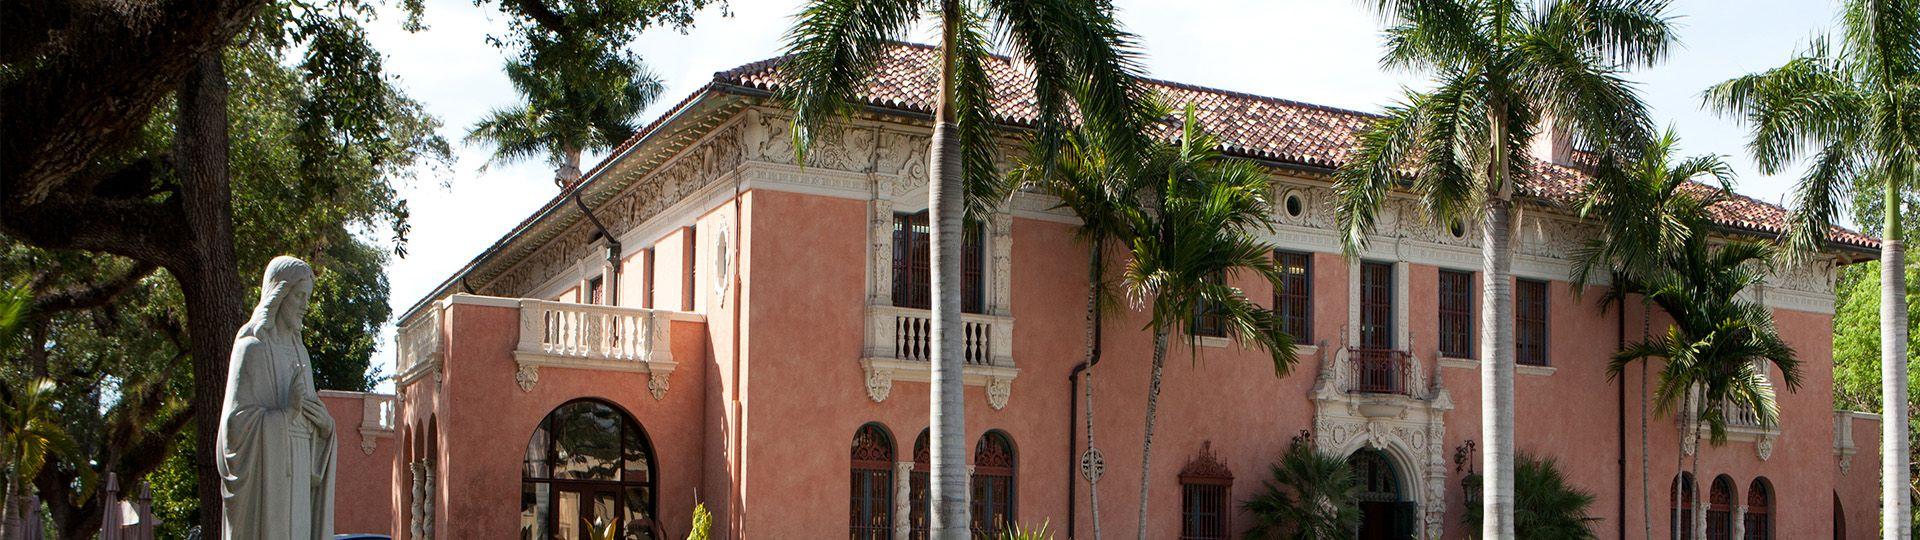 Carrollton School of the Sacred Heart   Acquisition of El Jardin by ...